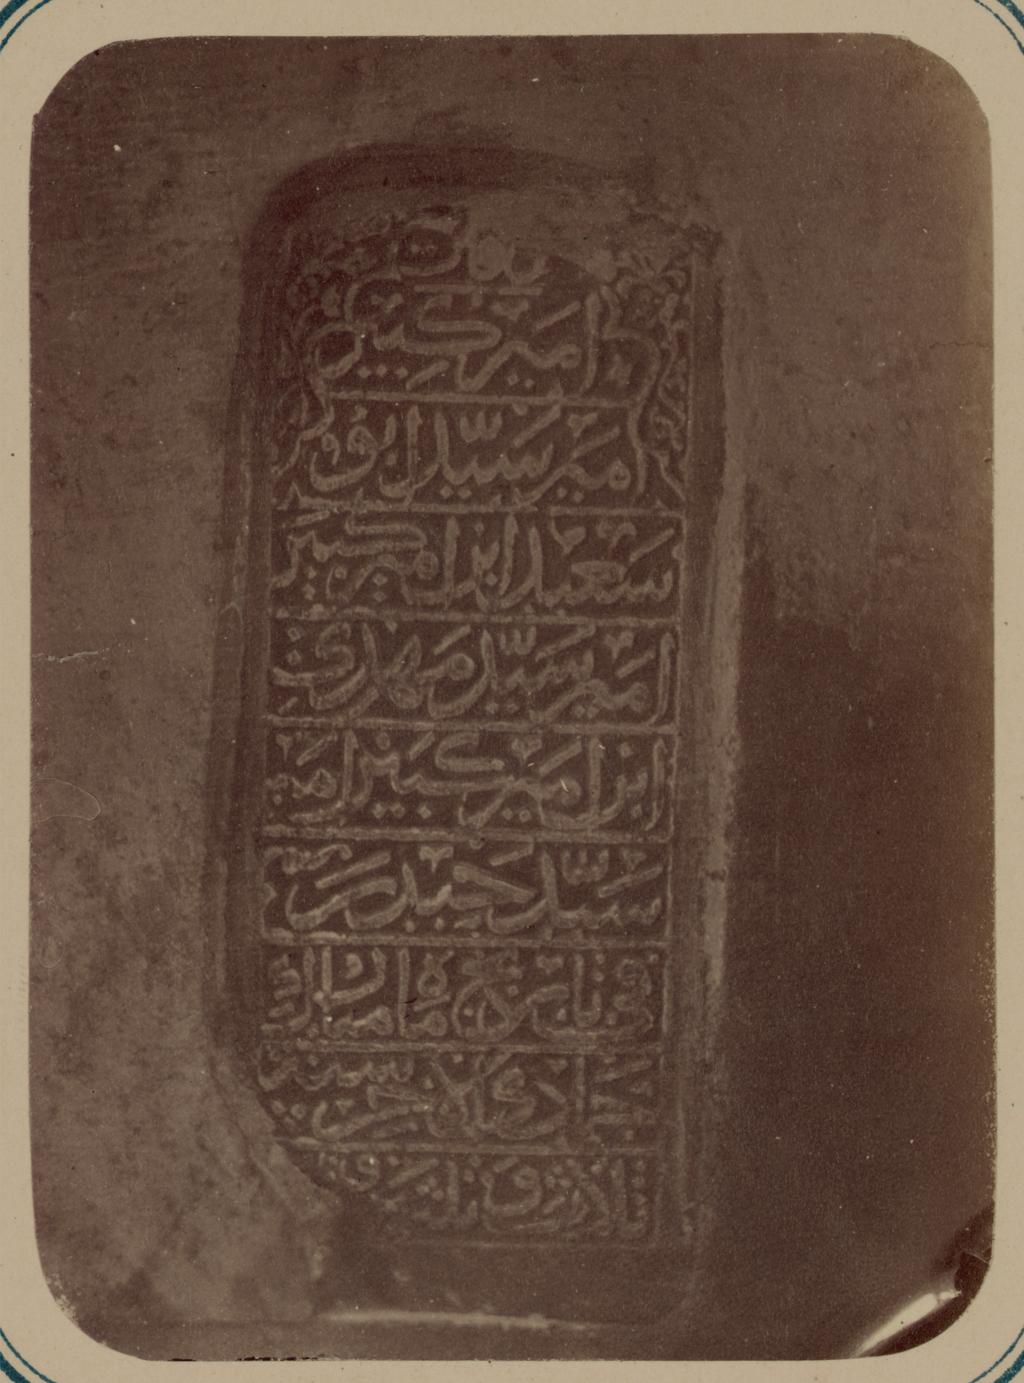 Внутренняя часть чартака. Надпись на стене напротив двери